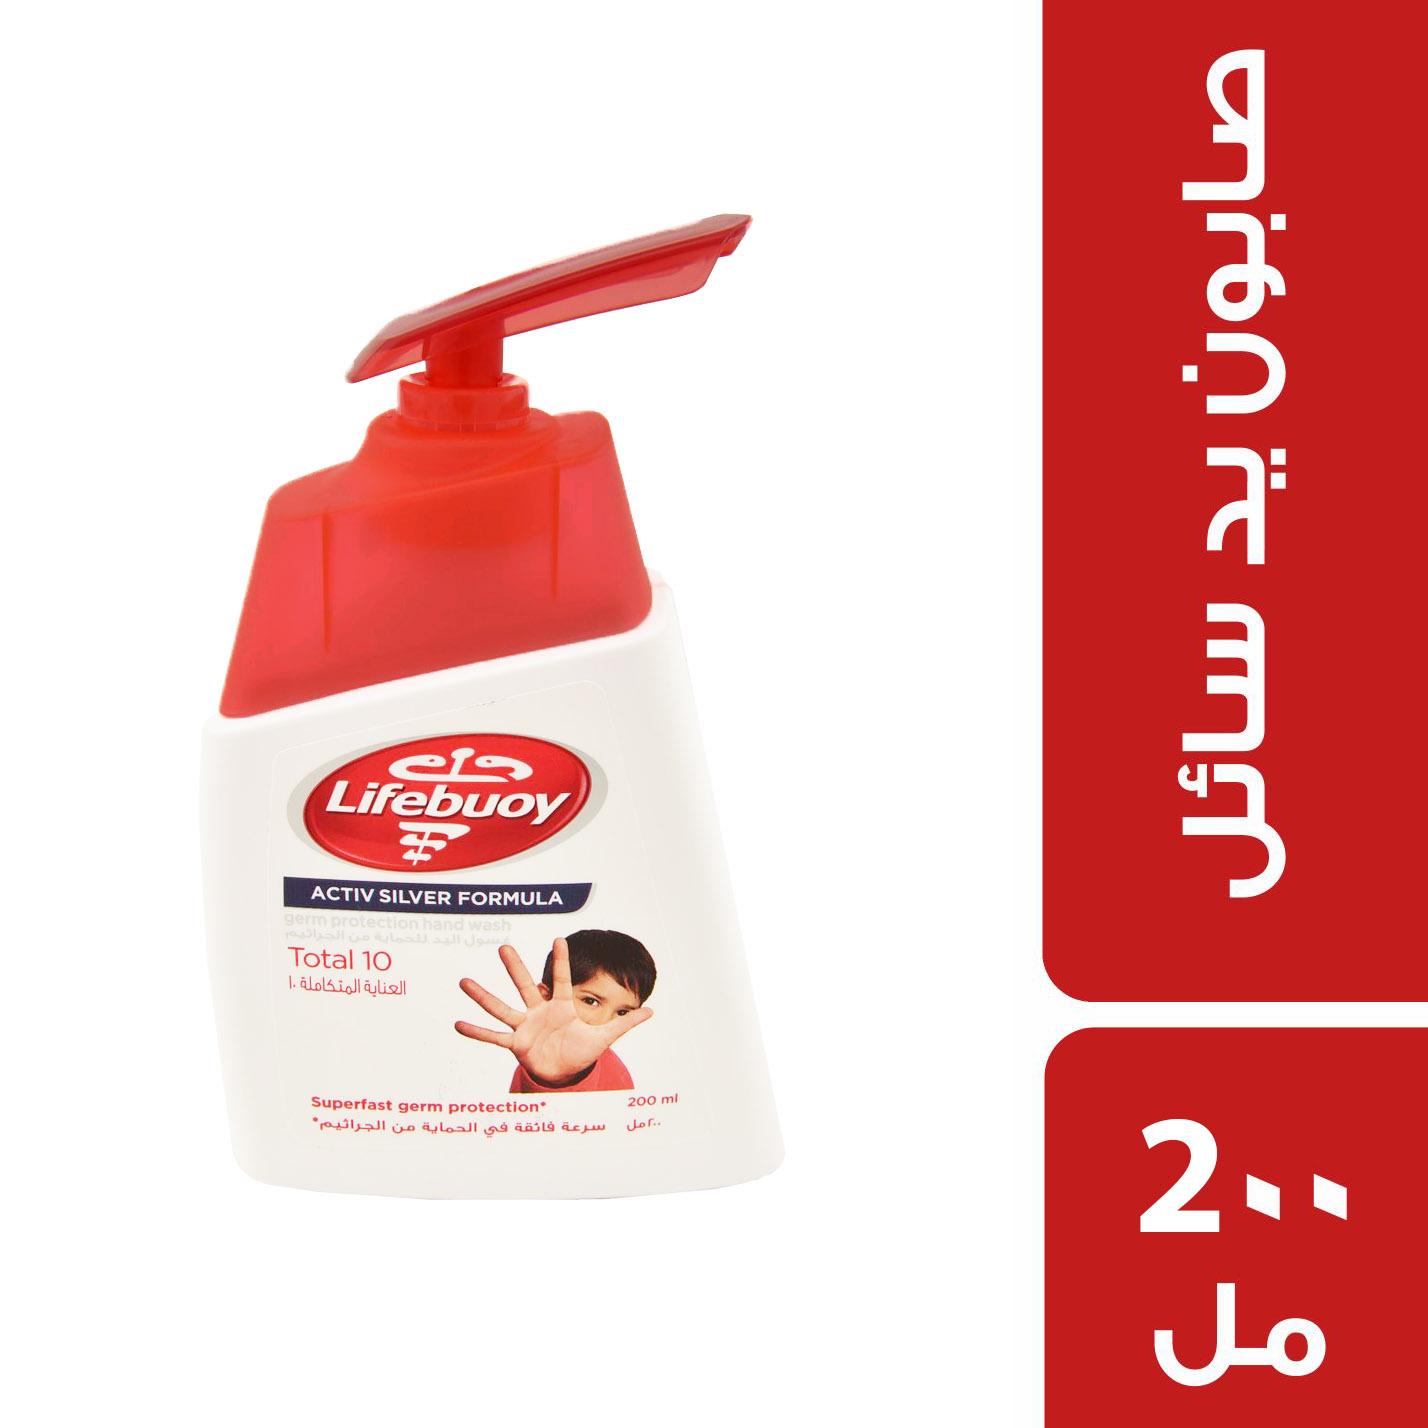 Lifebuoy Total 10 Liquid Hand Soap 200ml Upc